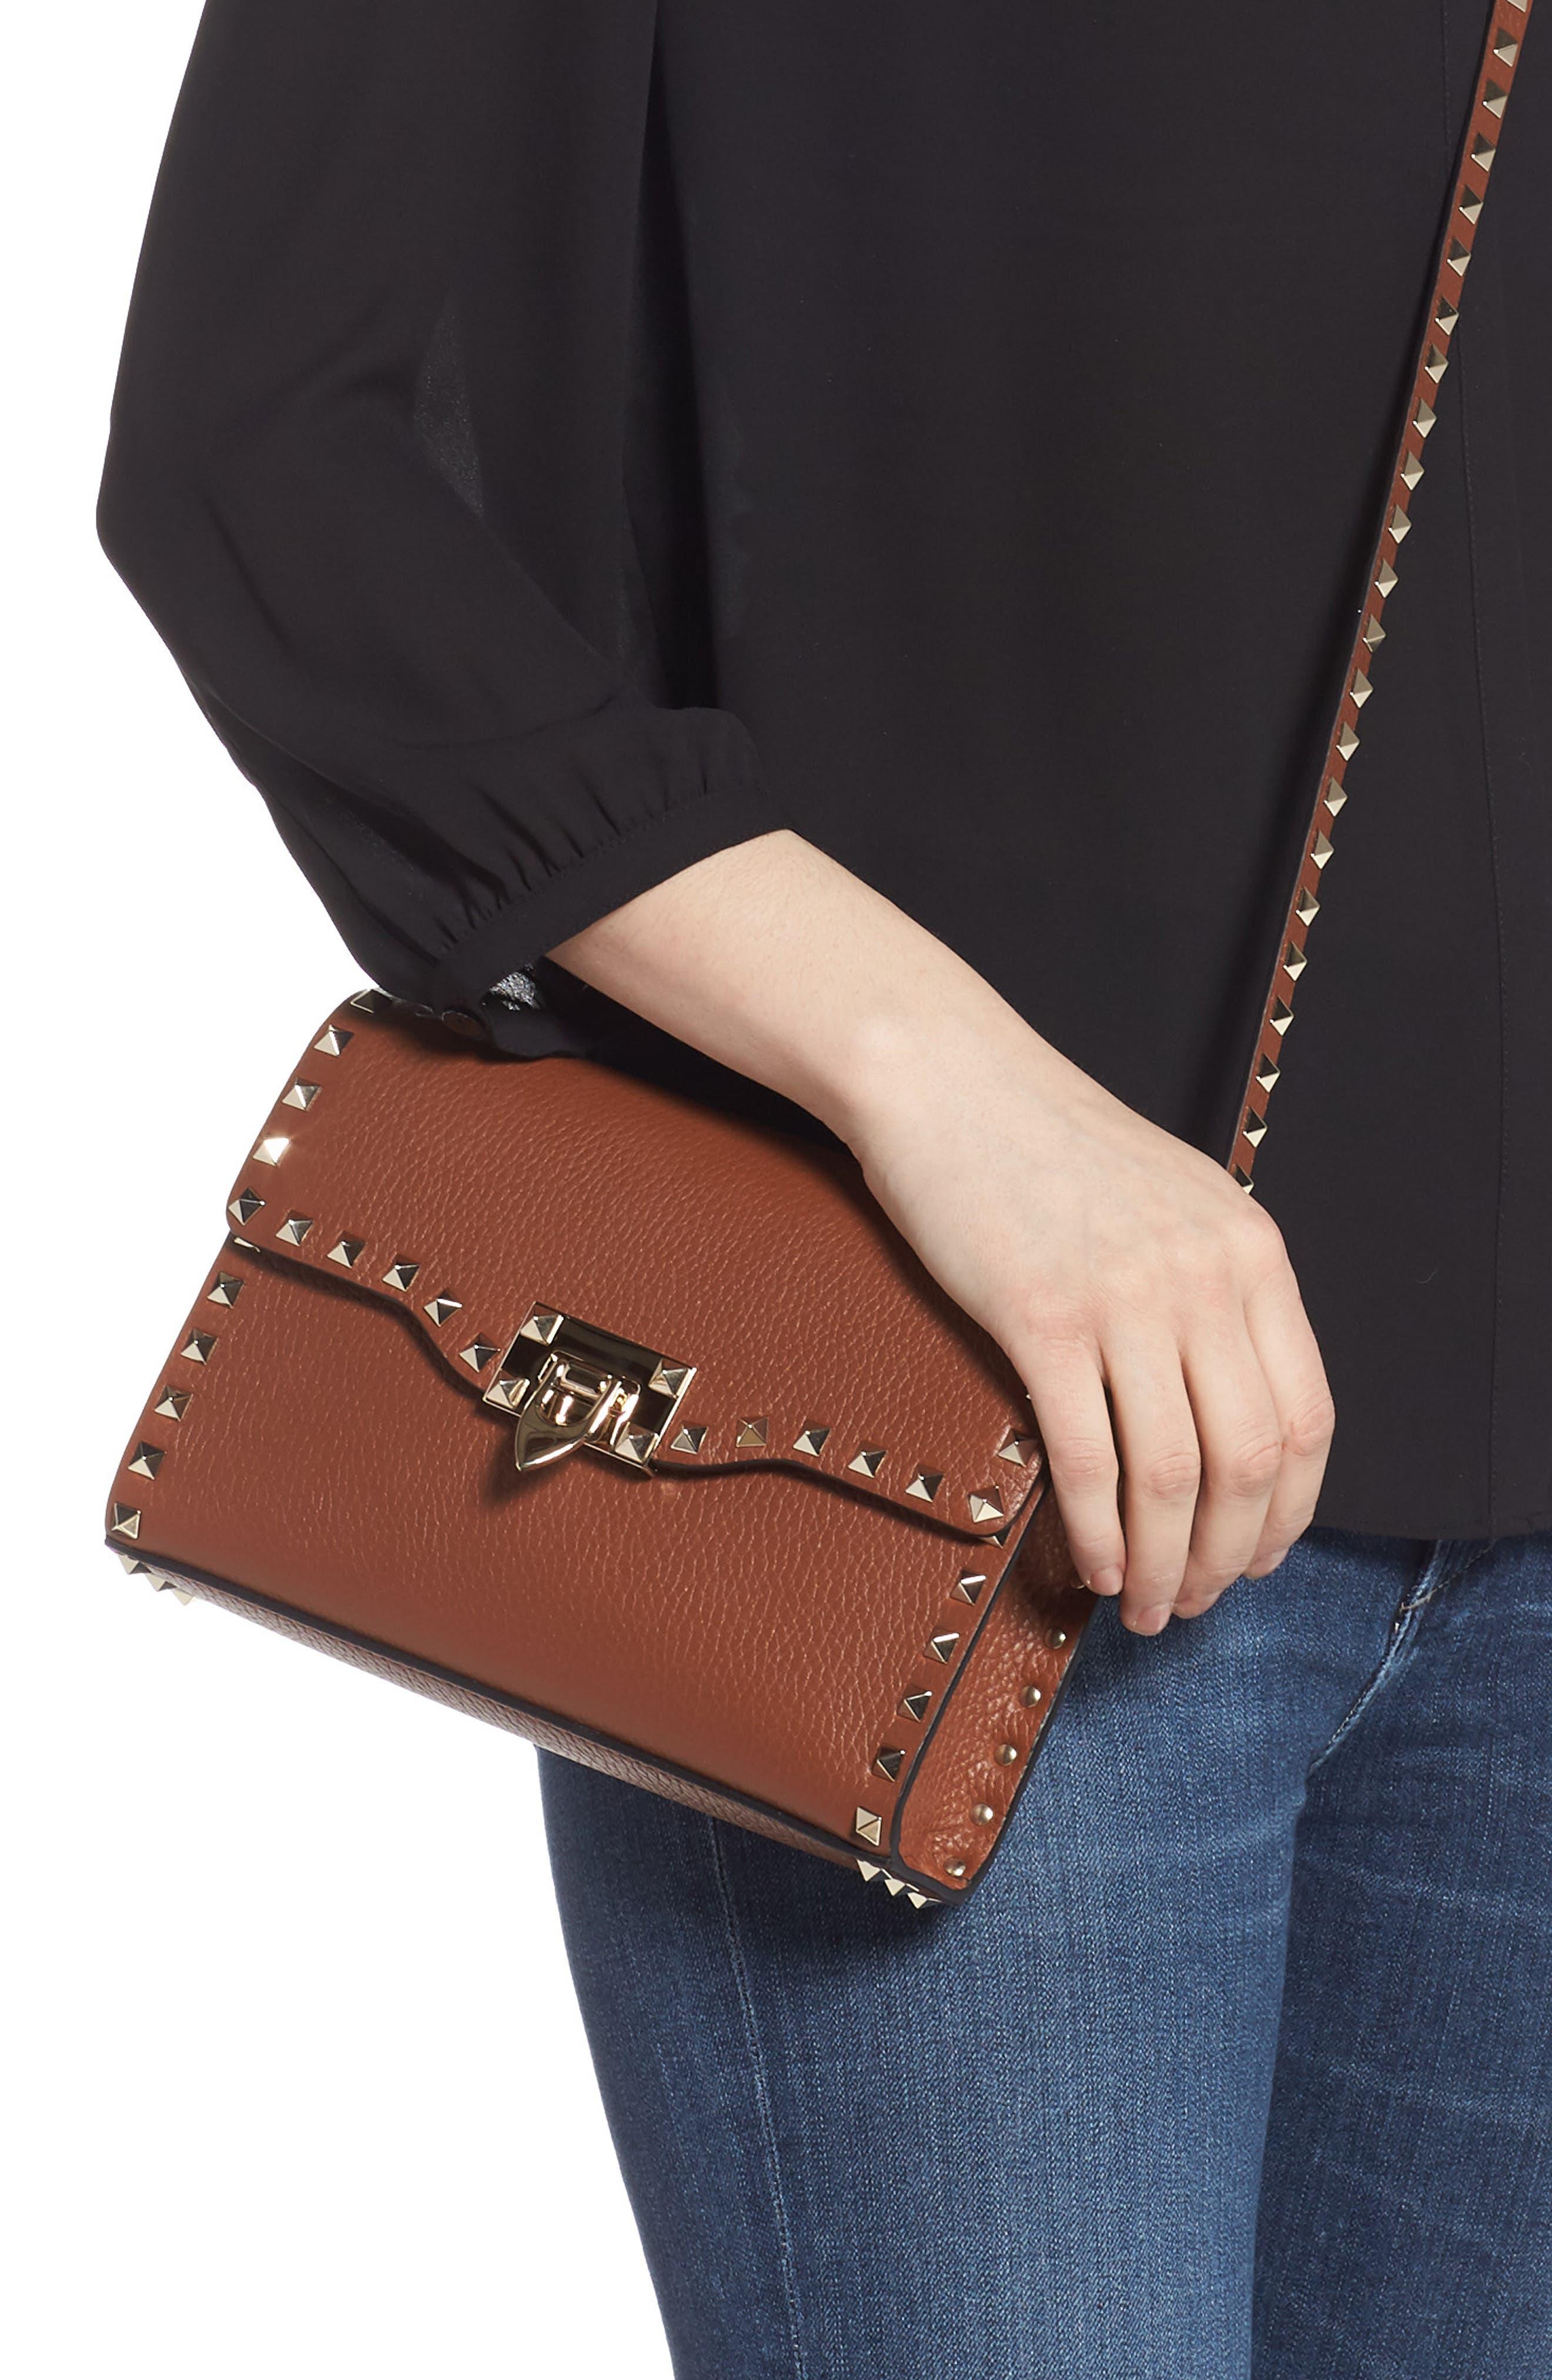 VALENTINO GARAVANI, Medium Rockstud Leather Crossbody Bag, Alternate thumbnail 2, color, BRIGHT COGNAC